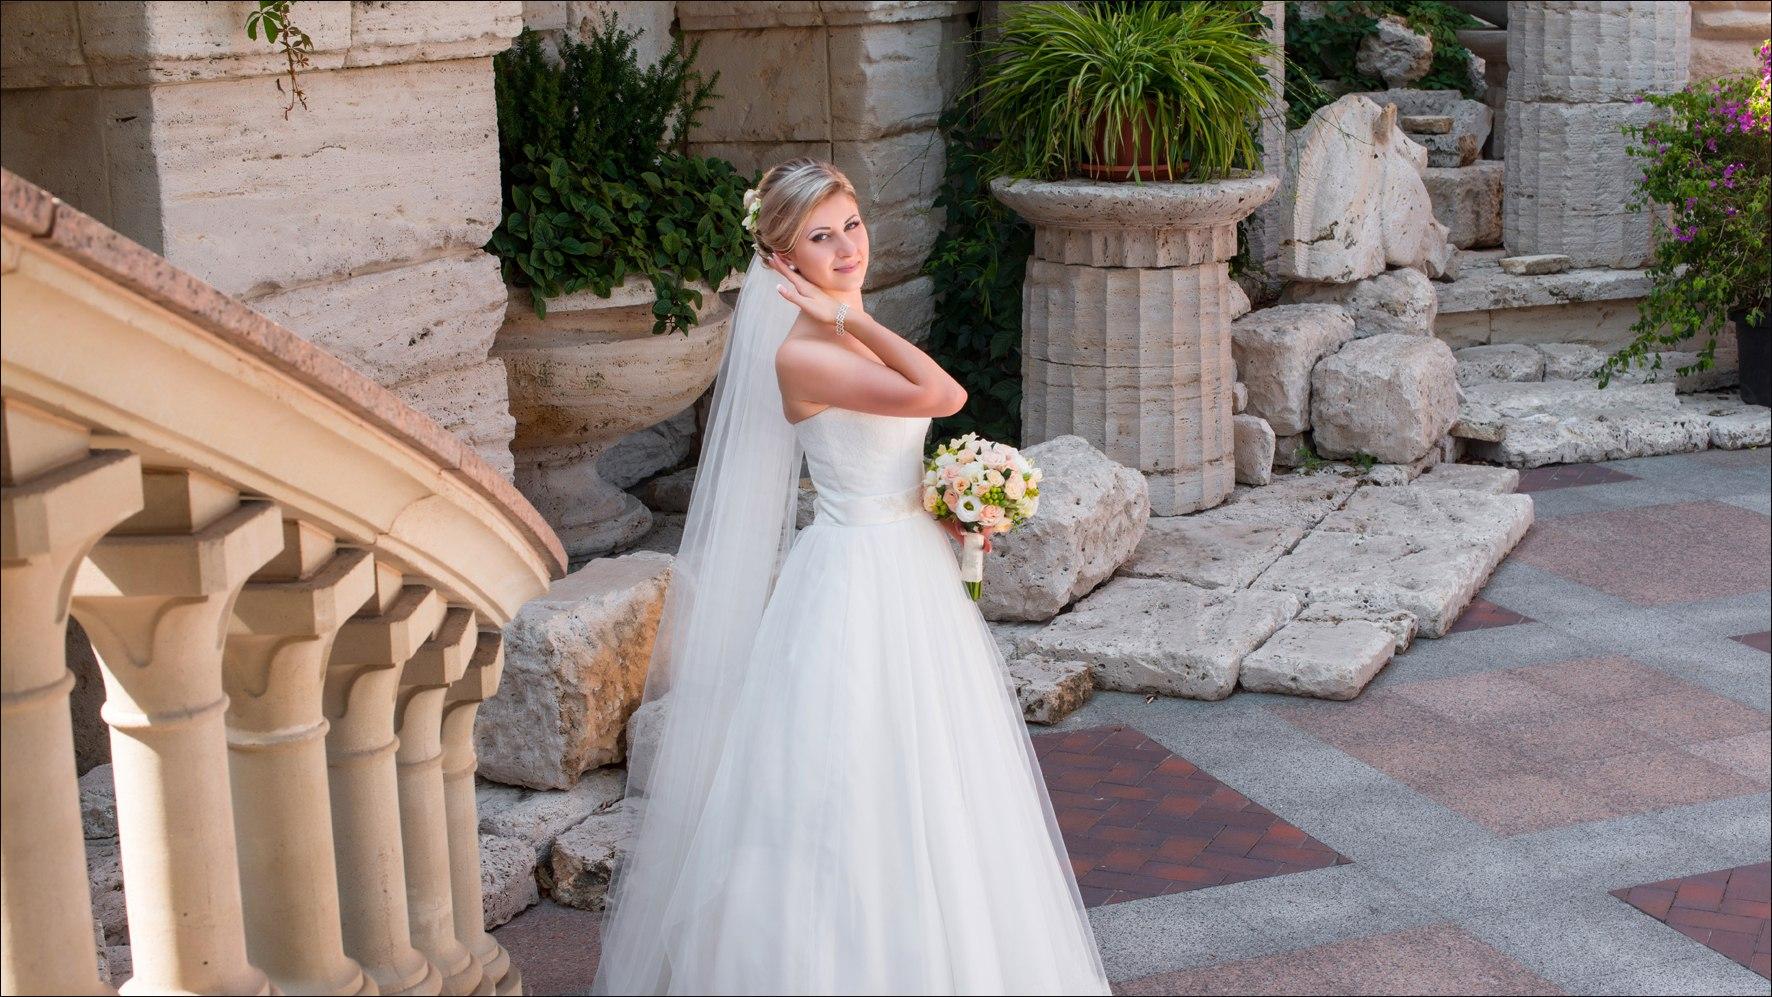 xNNbDl JVvI - Небылицы о свадебном бюджете